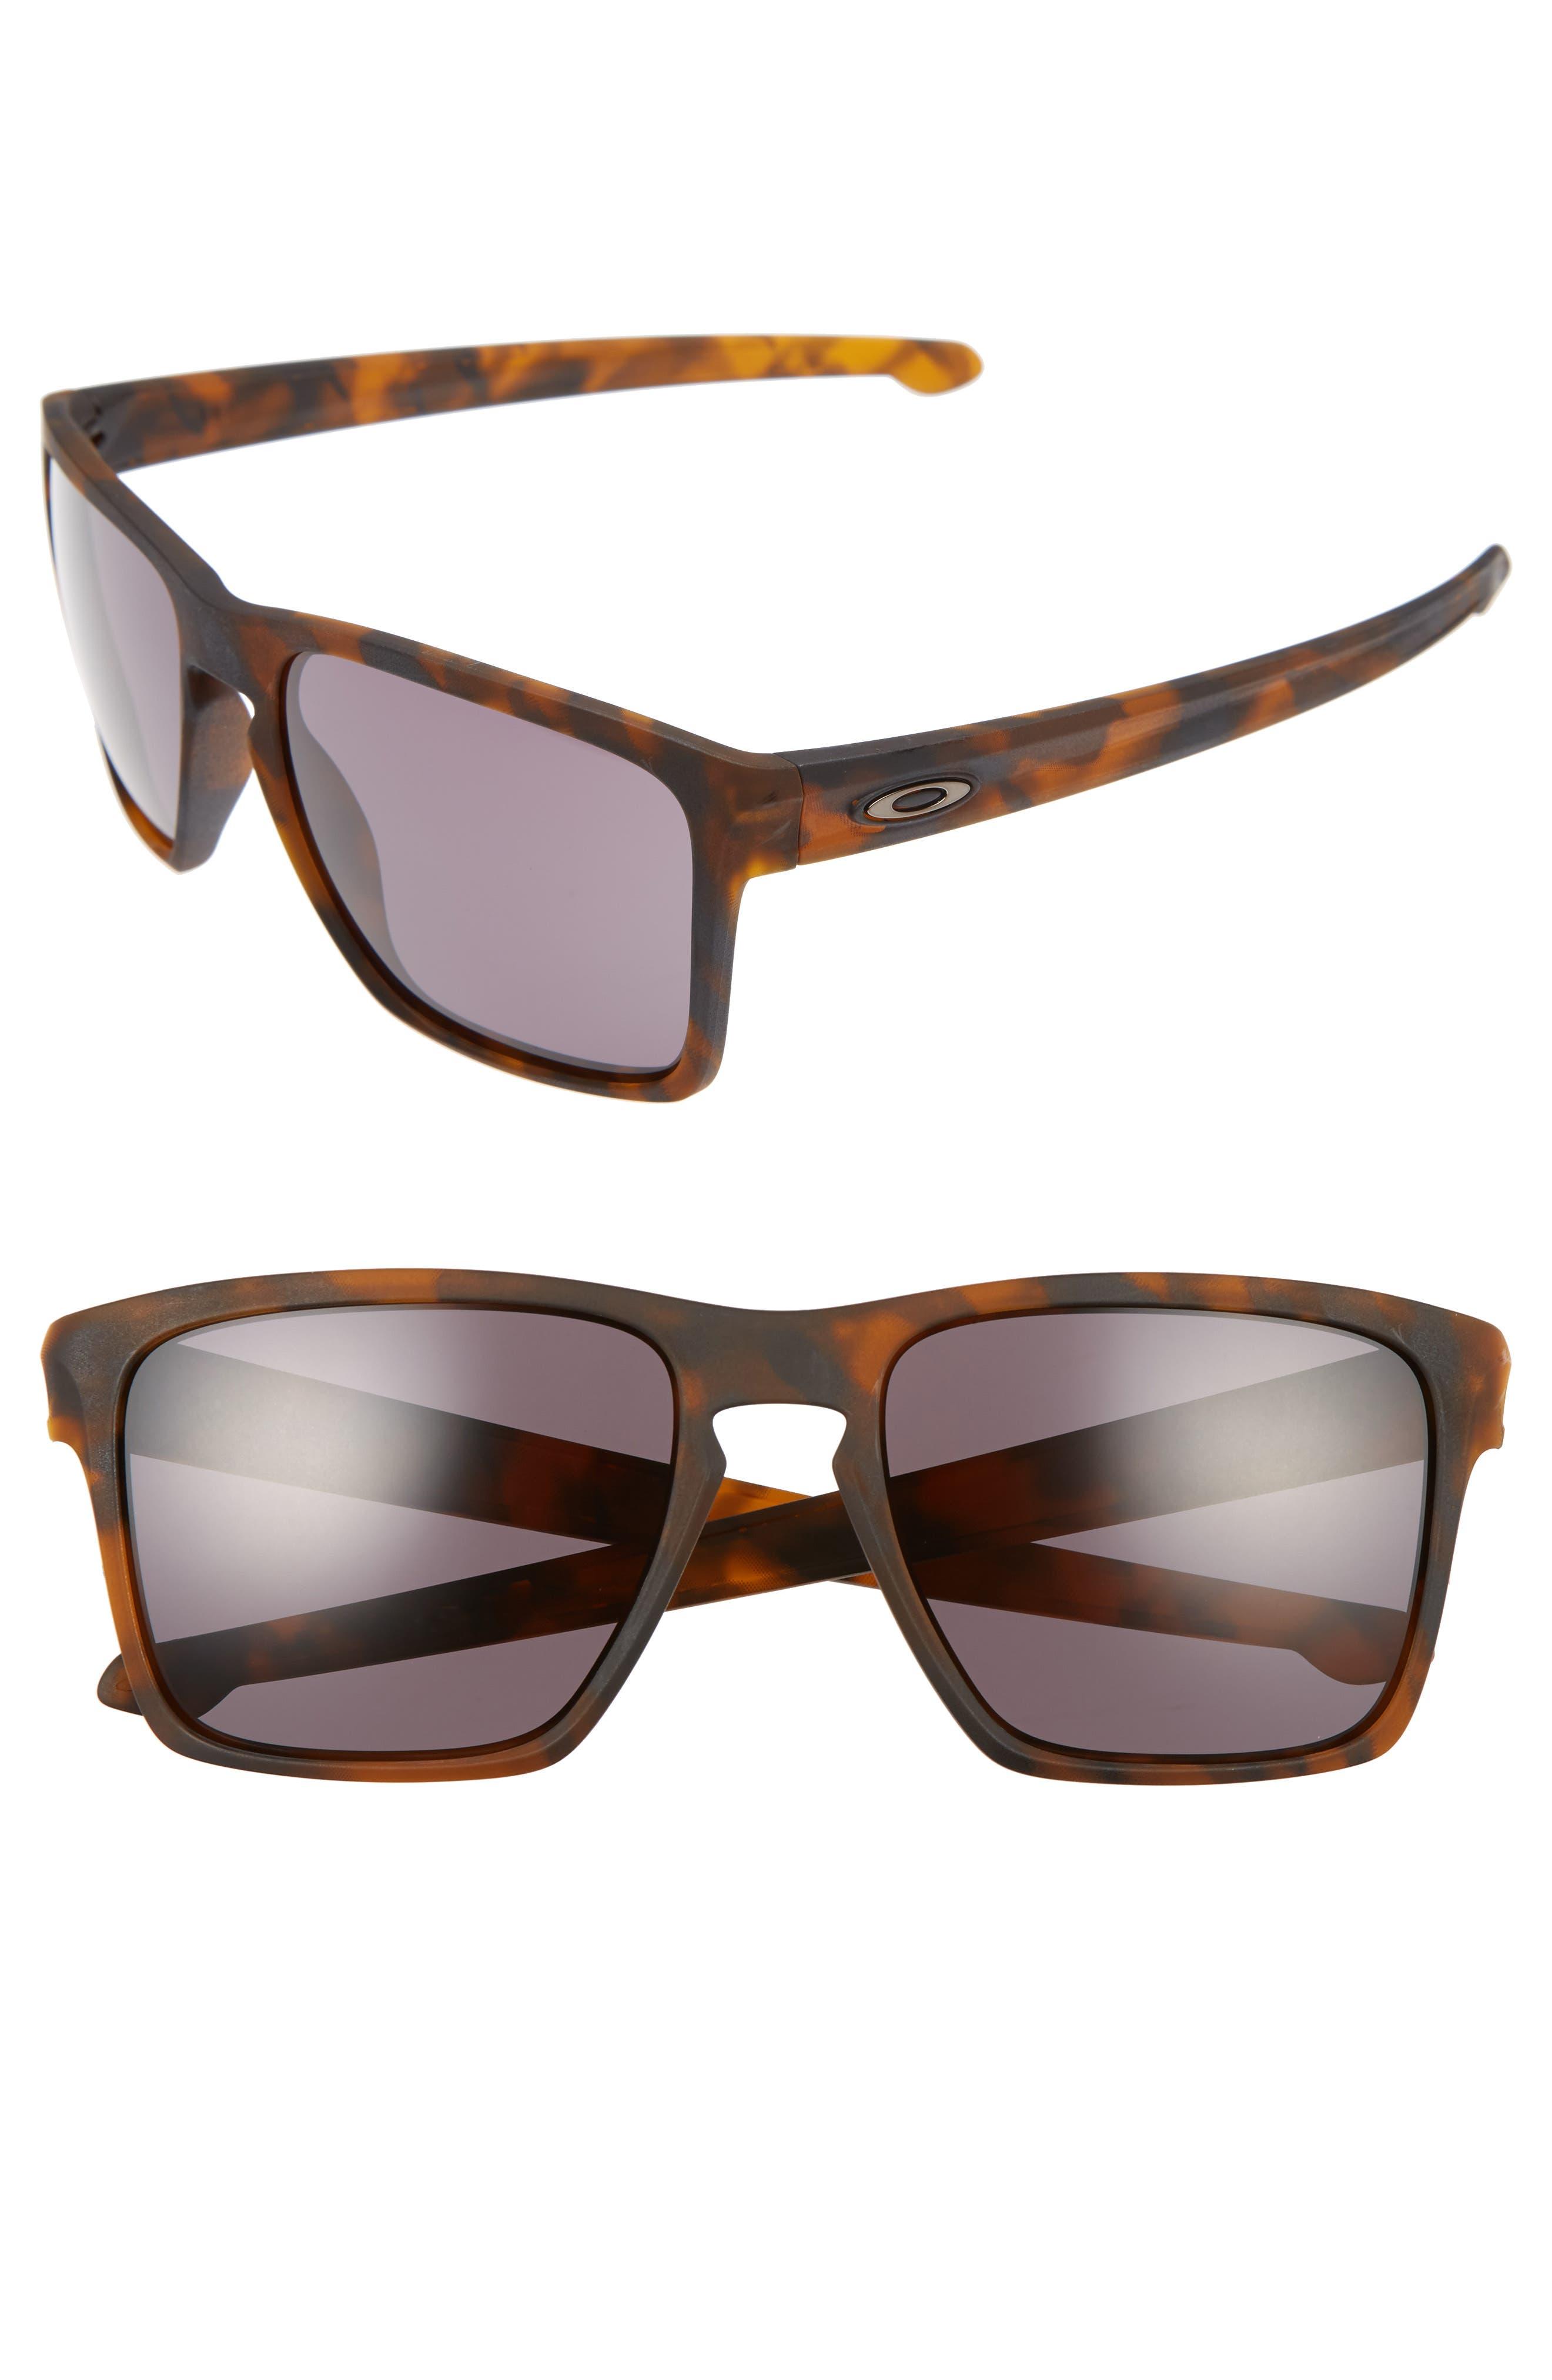 Oakley Silver Xl 57Mm Sunglasses -